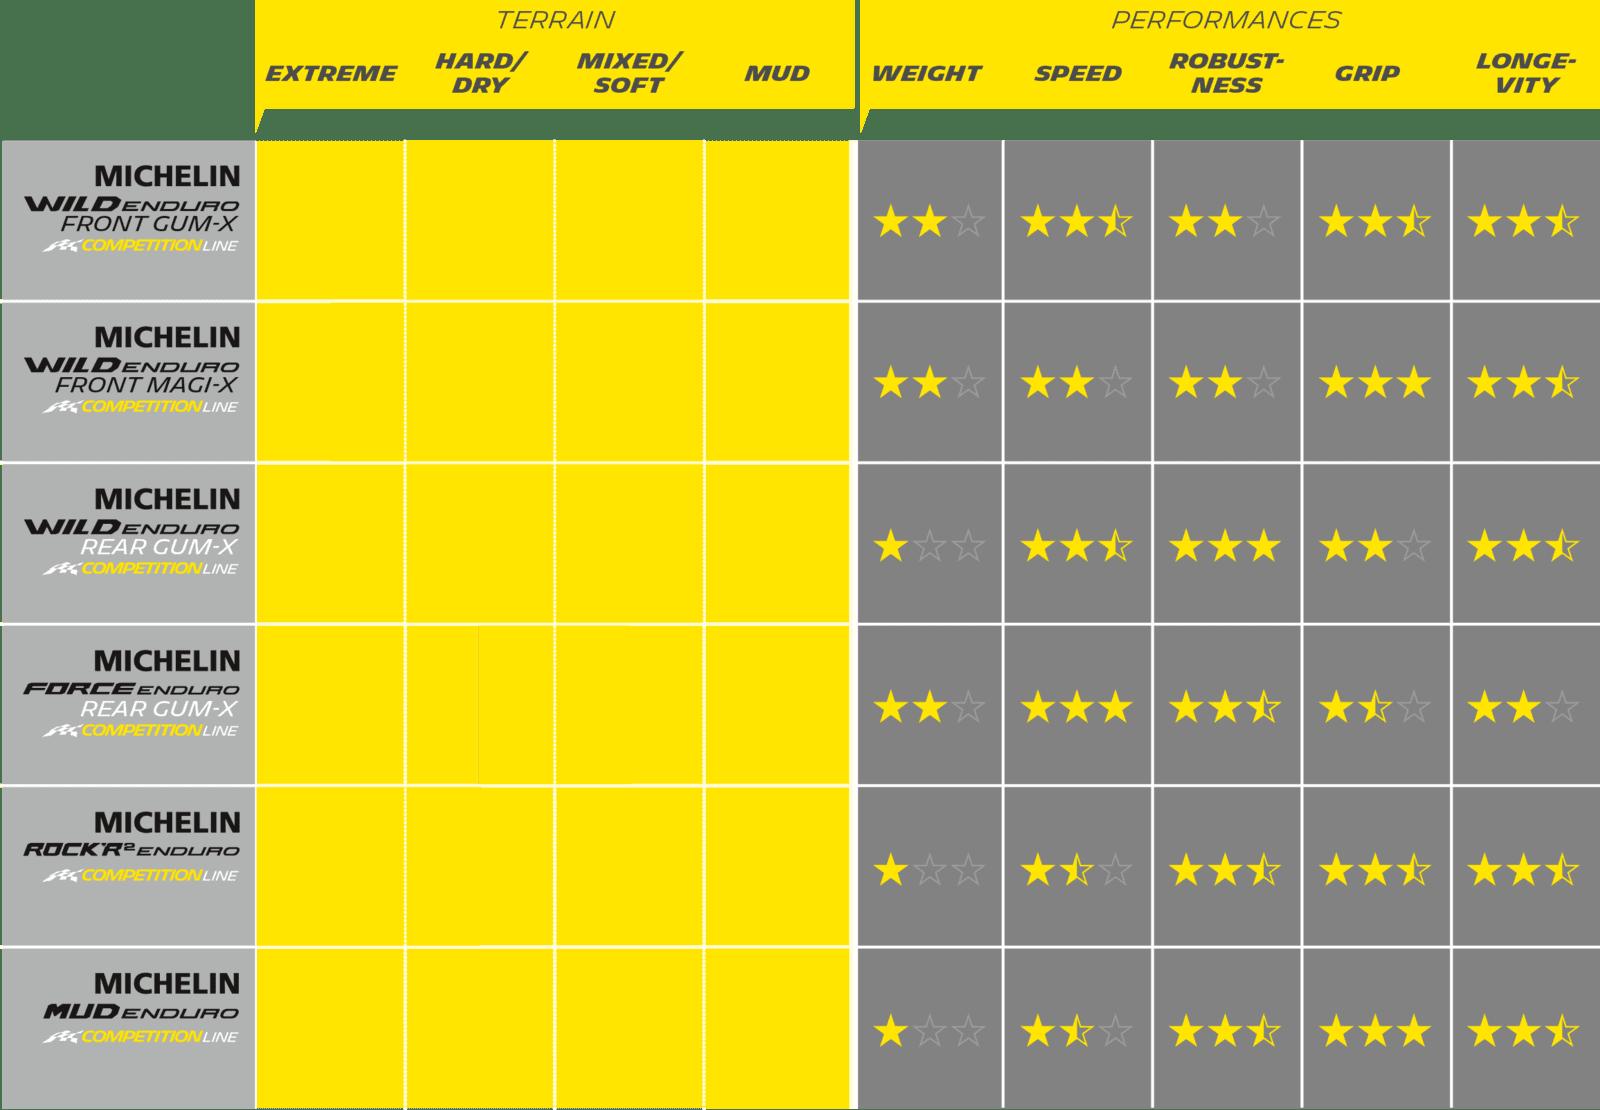 Michelin Wild Enduro table